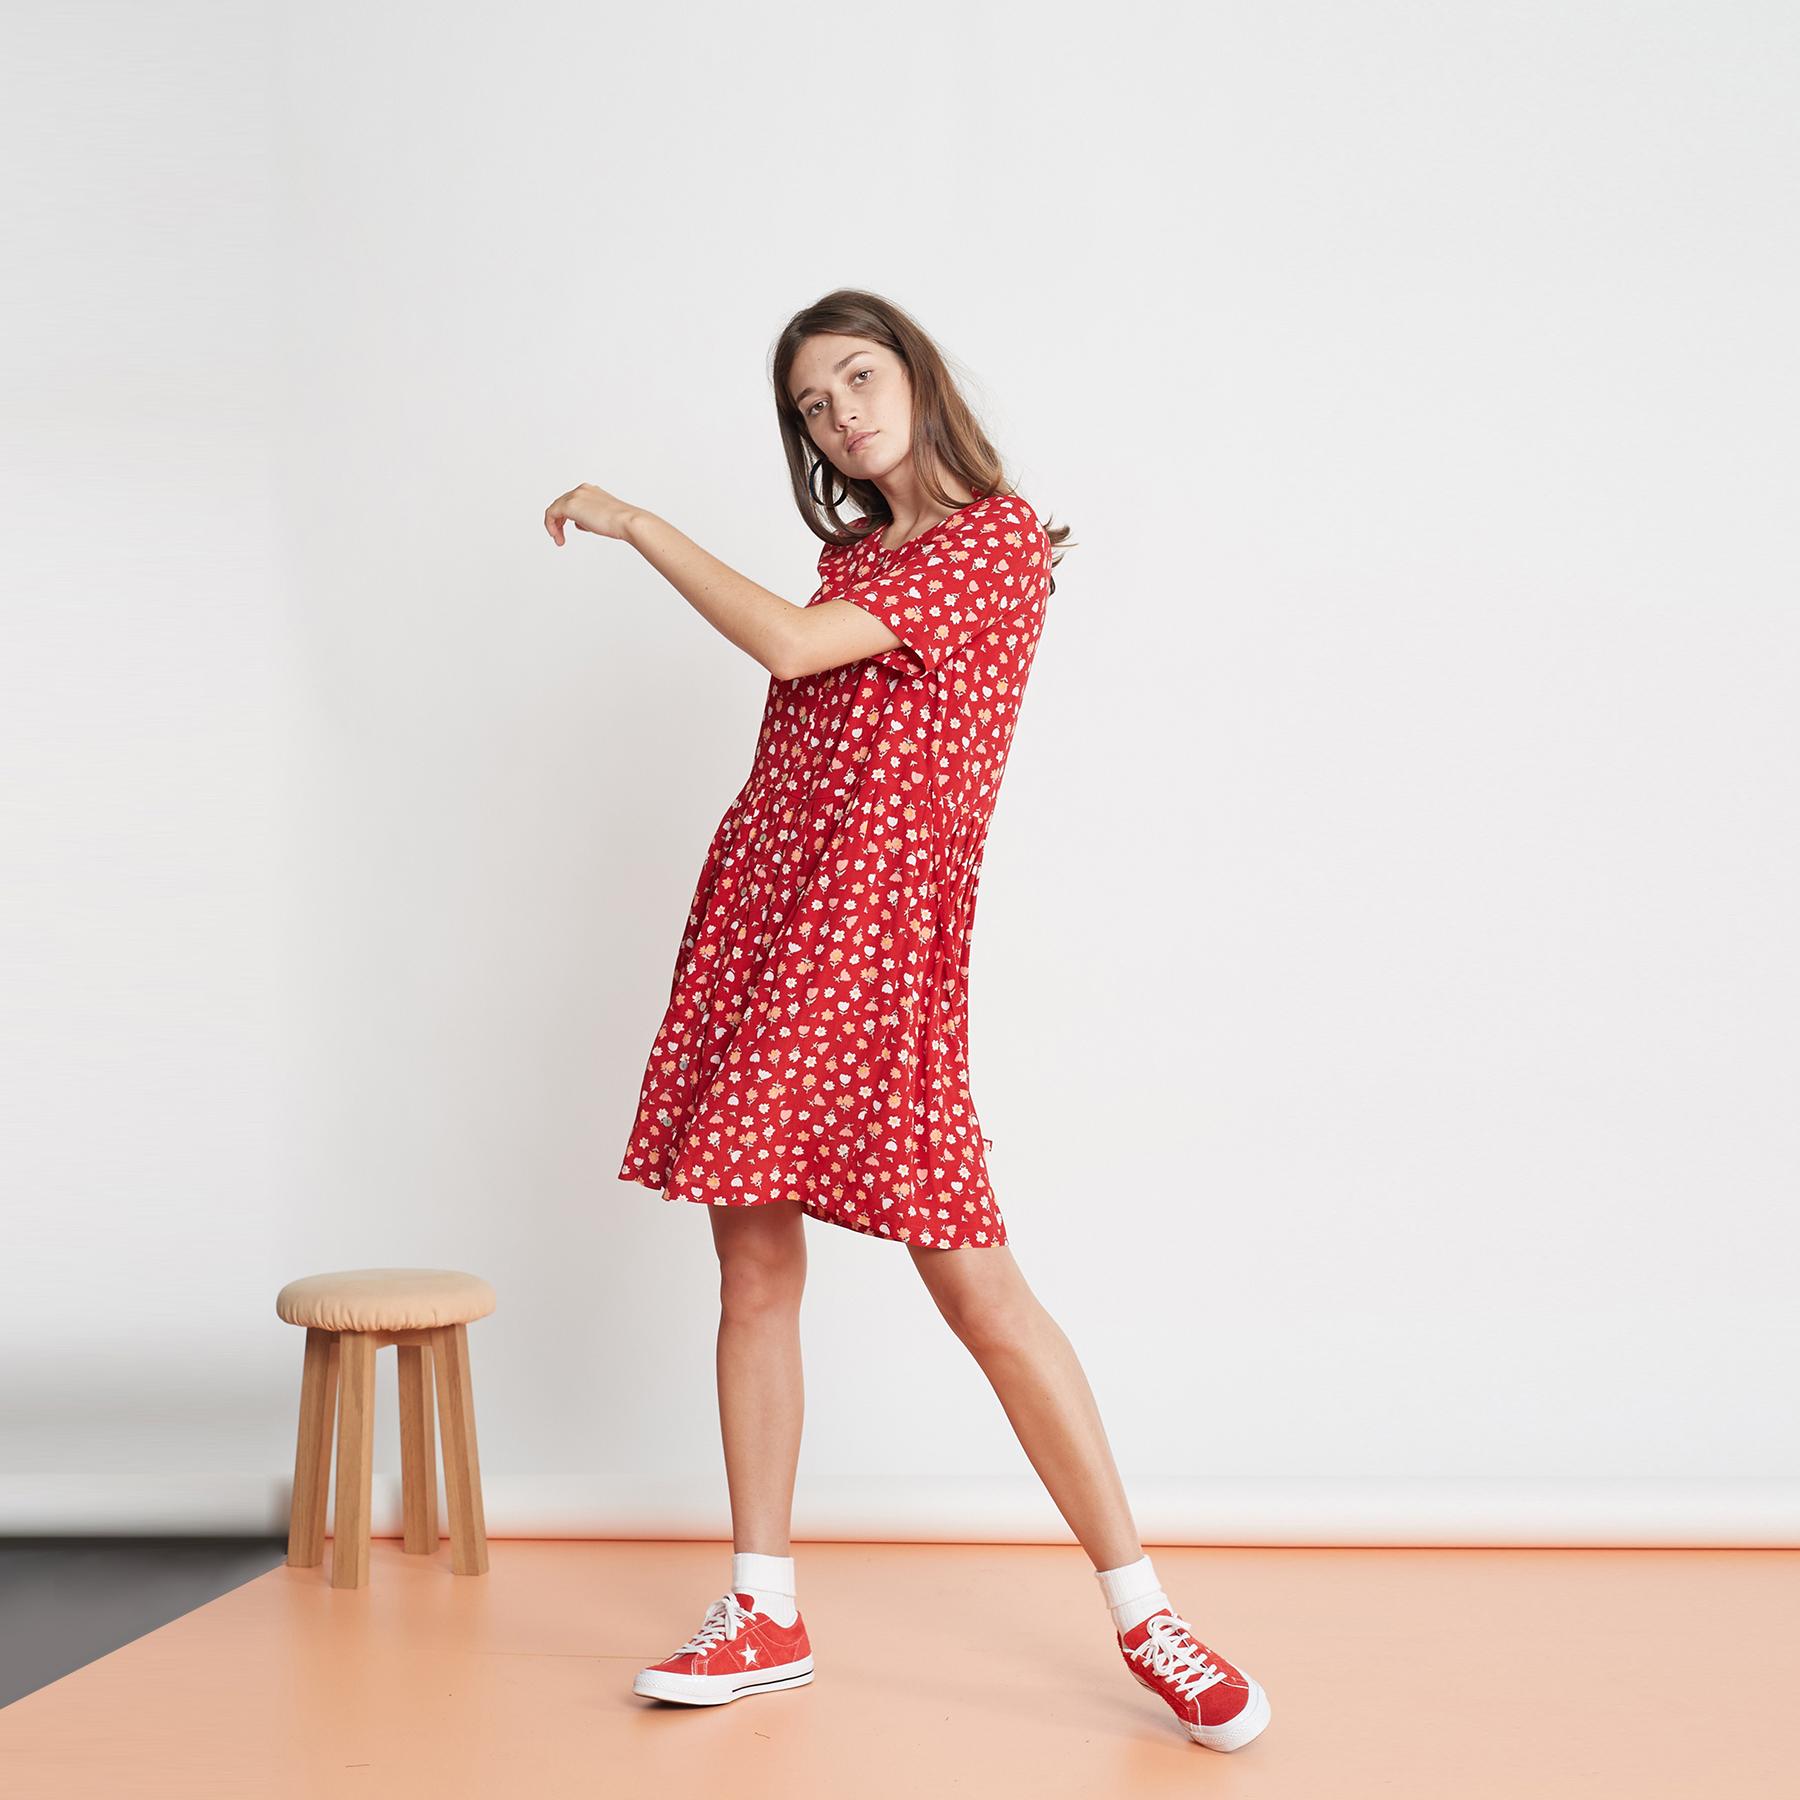 LB squares_0007_37. The Pilot dress_Red.jpg